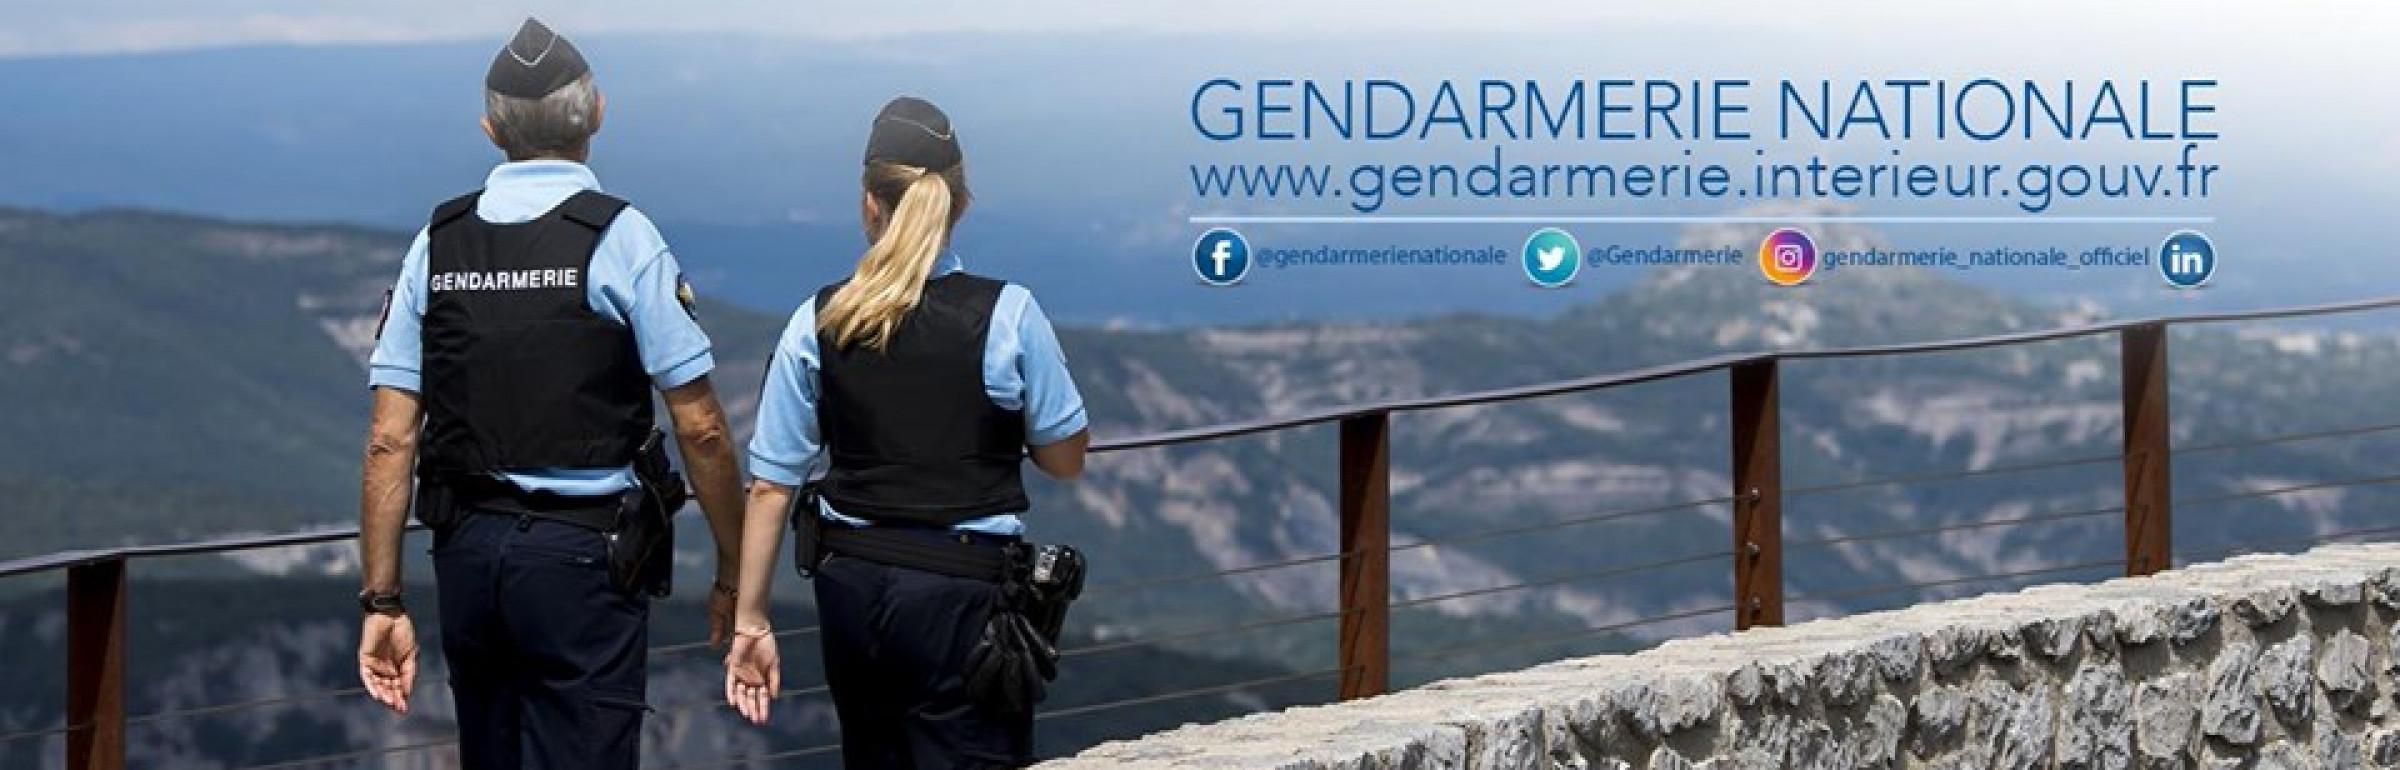 Banner Gendarmerie Nationale (cir Strasbourg)